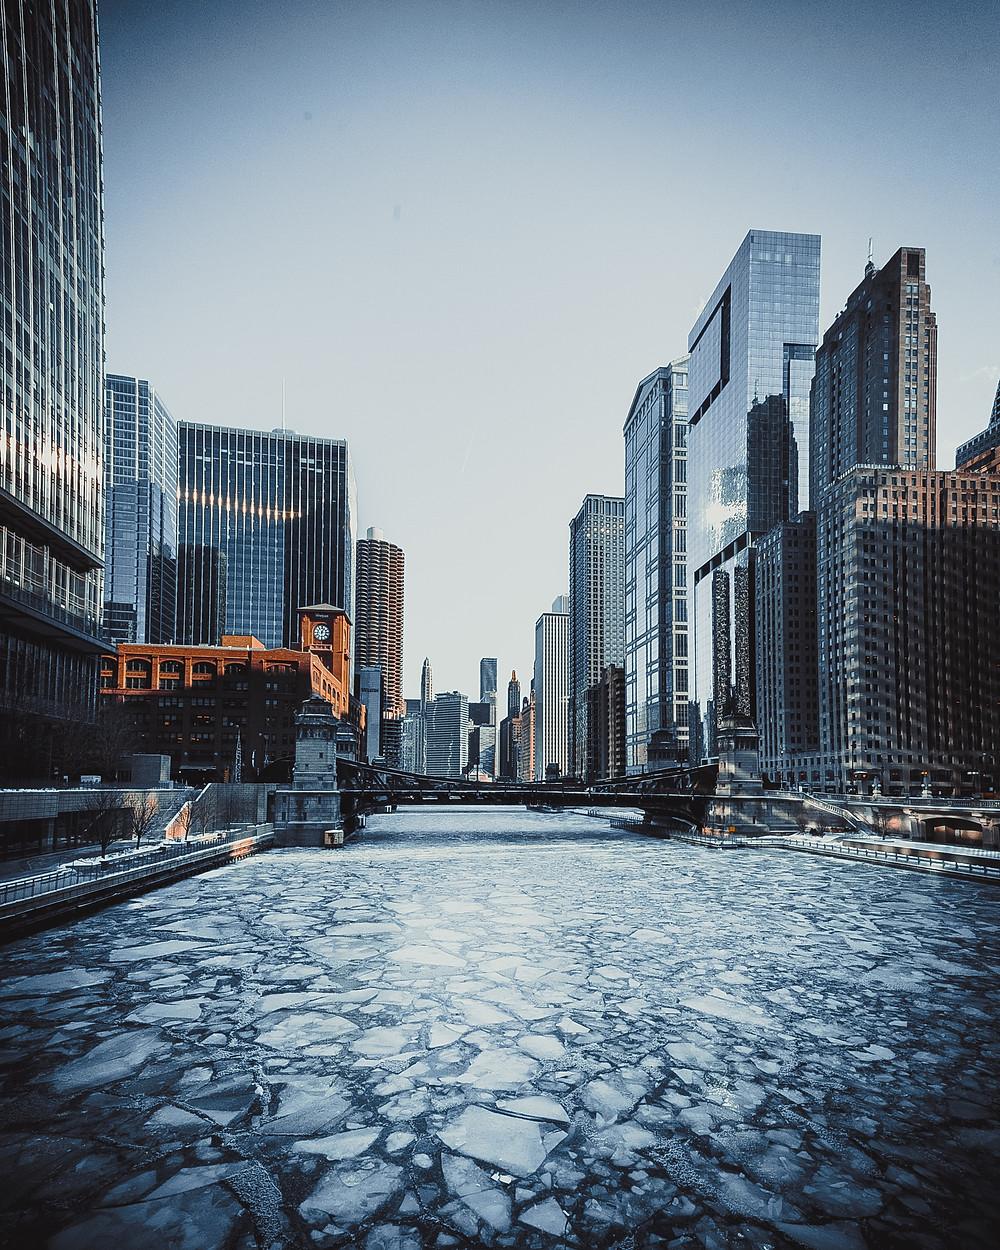 a cityscape with a semi frozen river